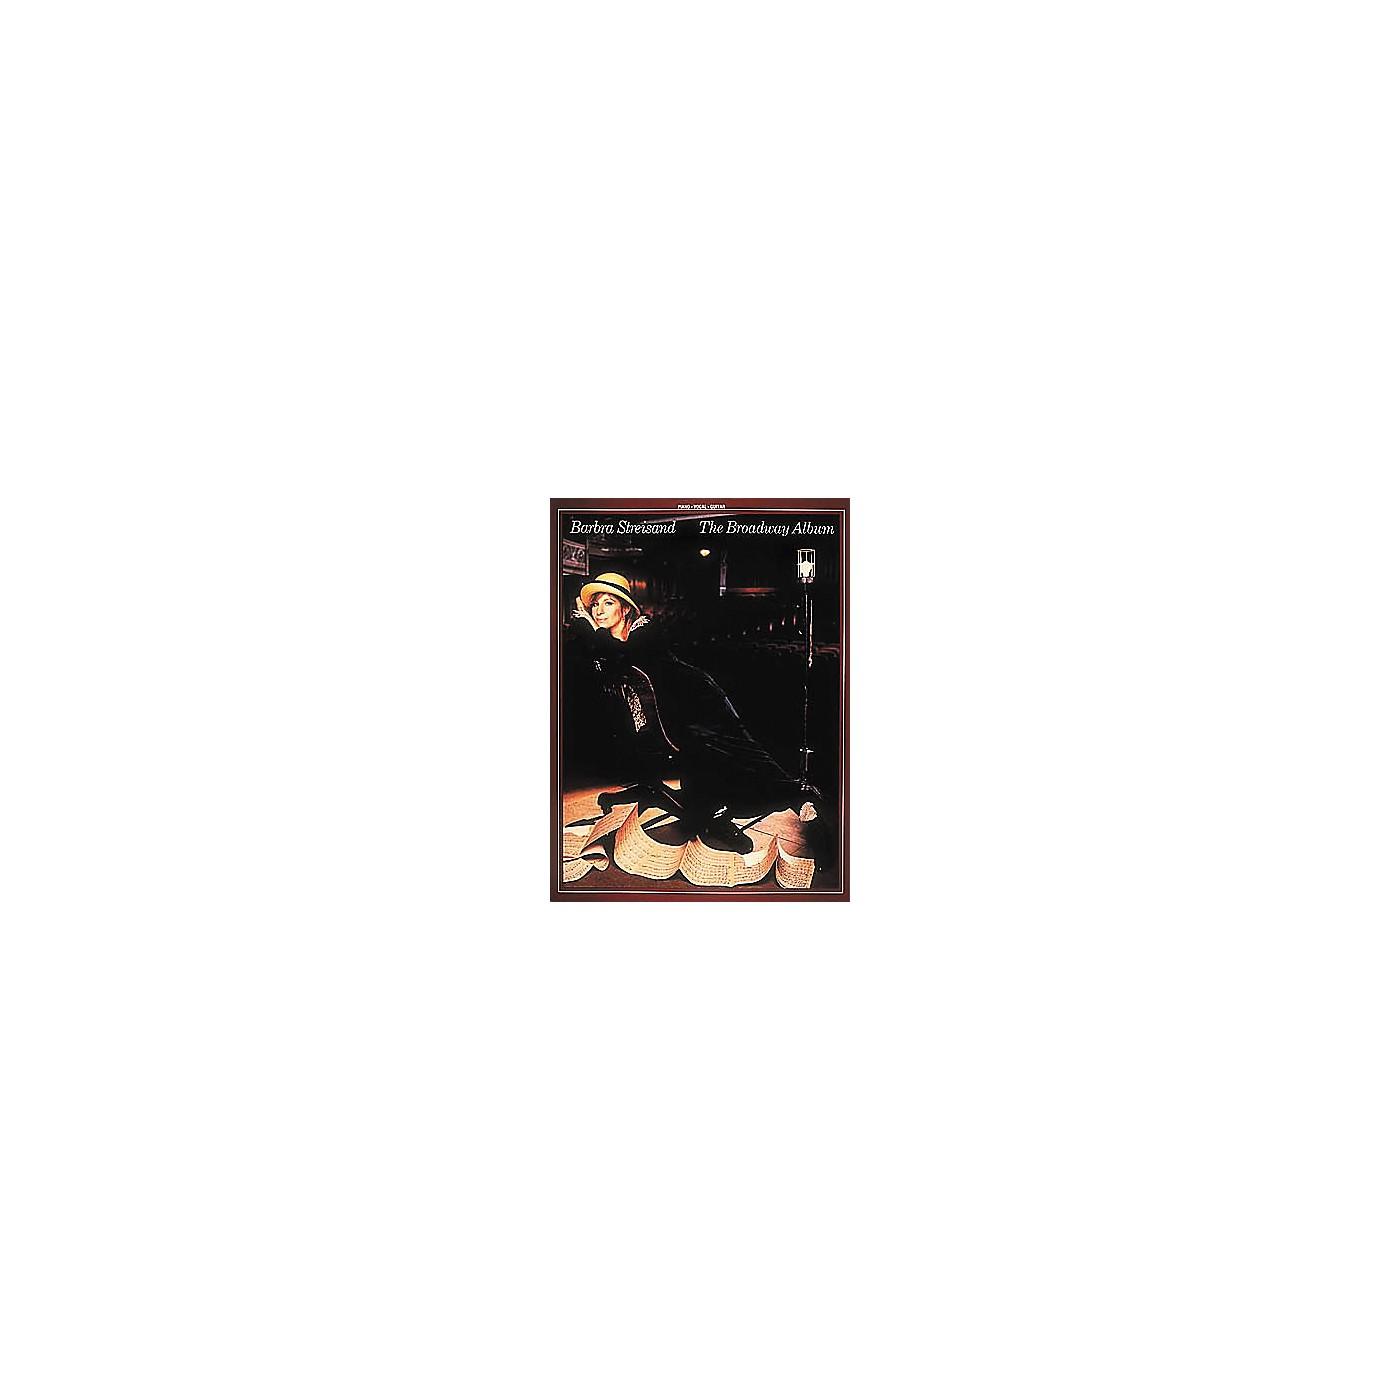 Hal Leonard Barbra Streisand - The Broadway Album Piano, Vocal, Guitar Songbook thumbnail